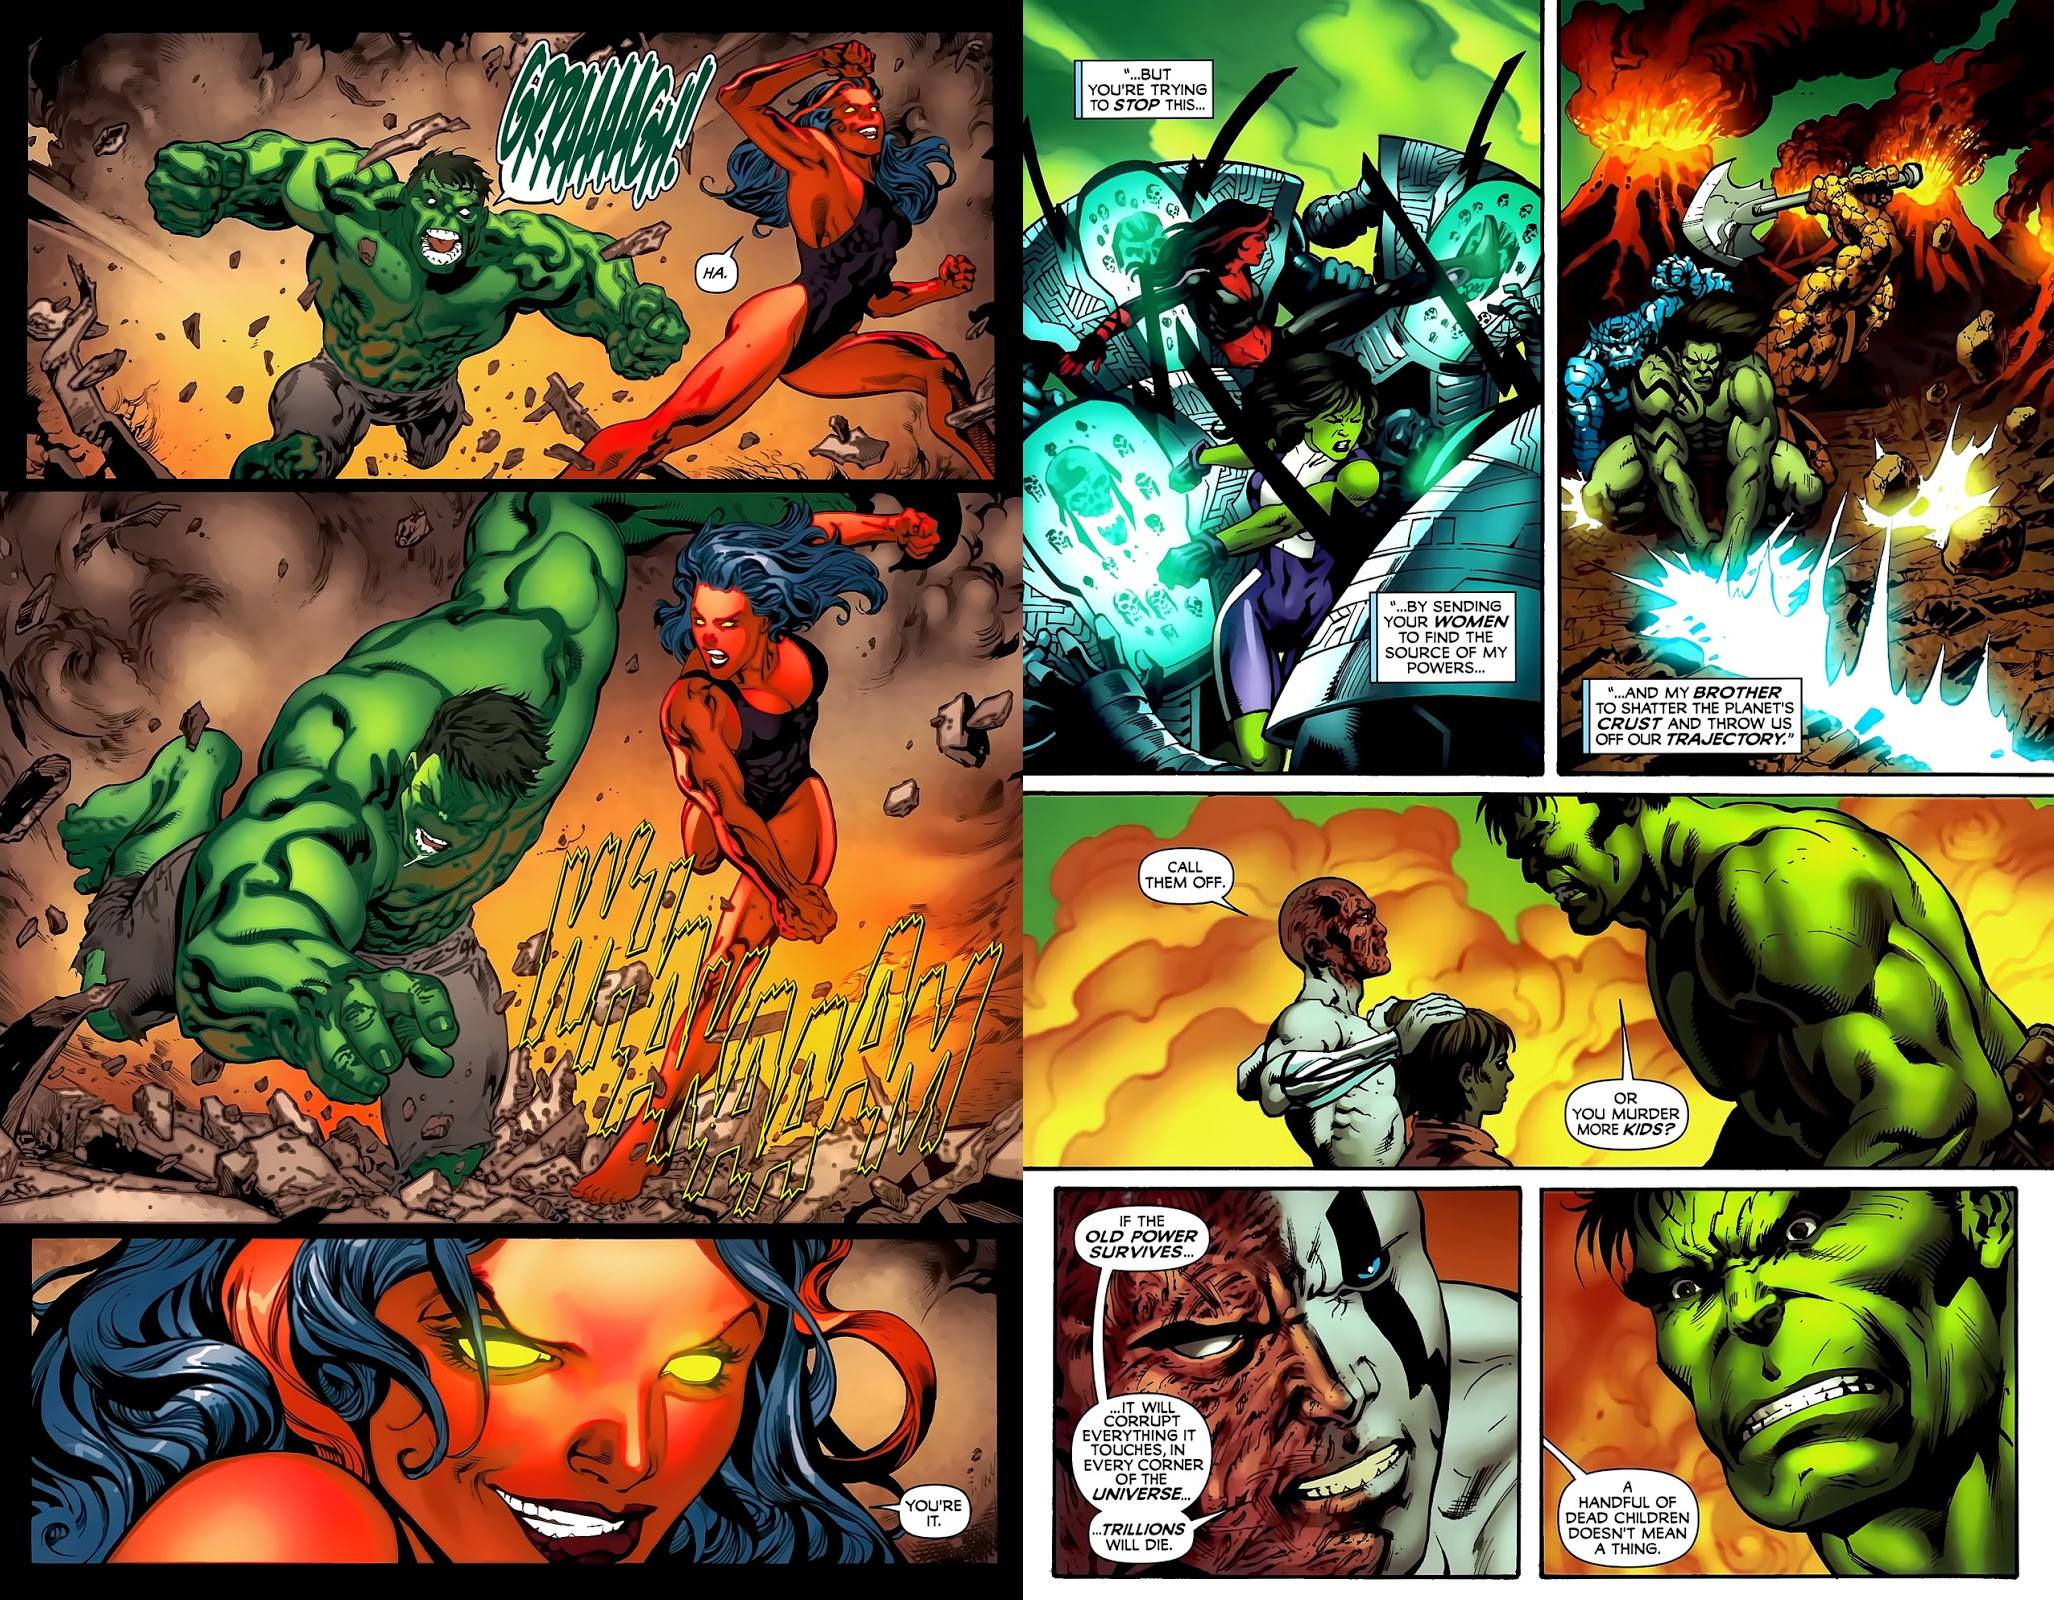 The Incredible Hulks Dark Son review